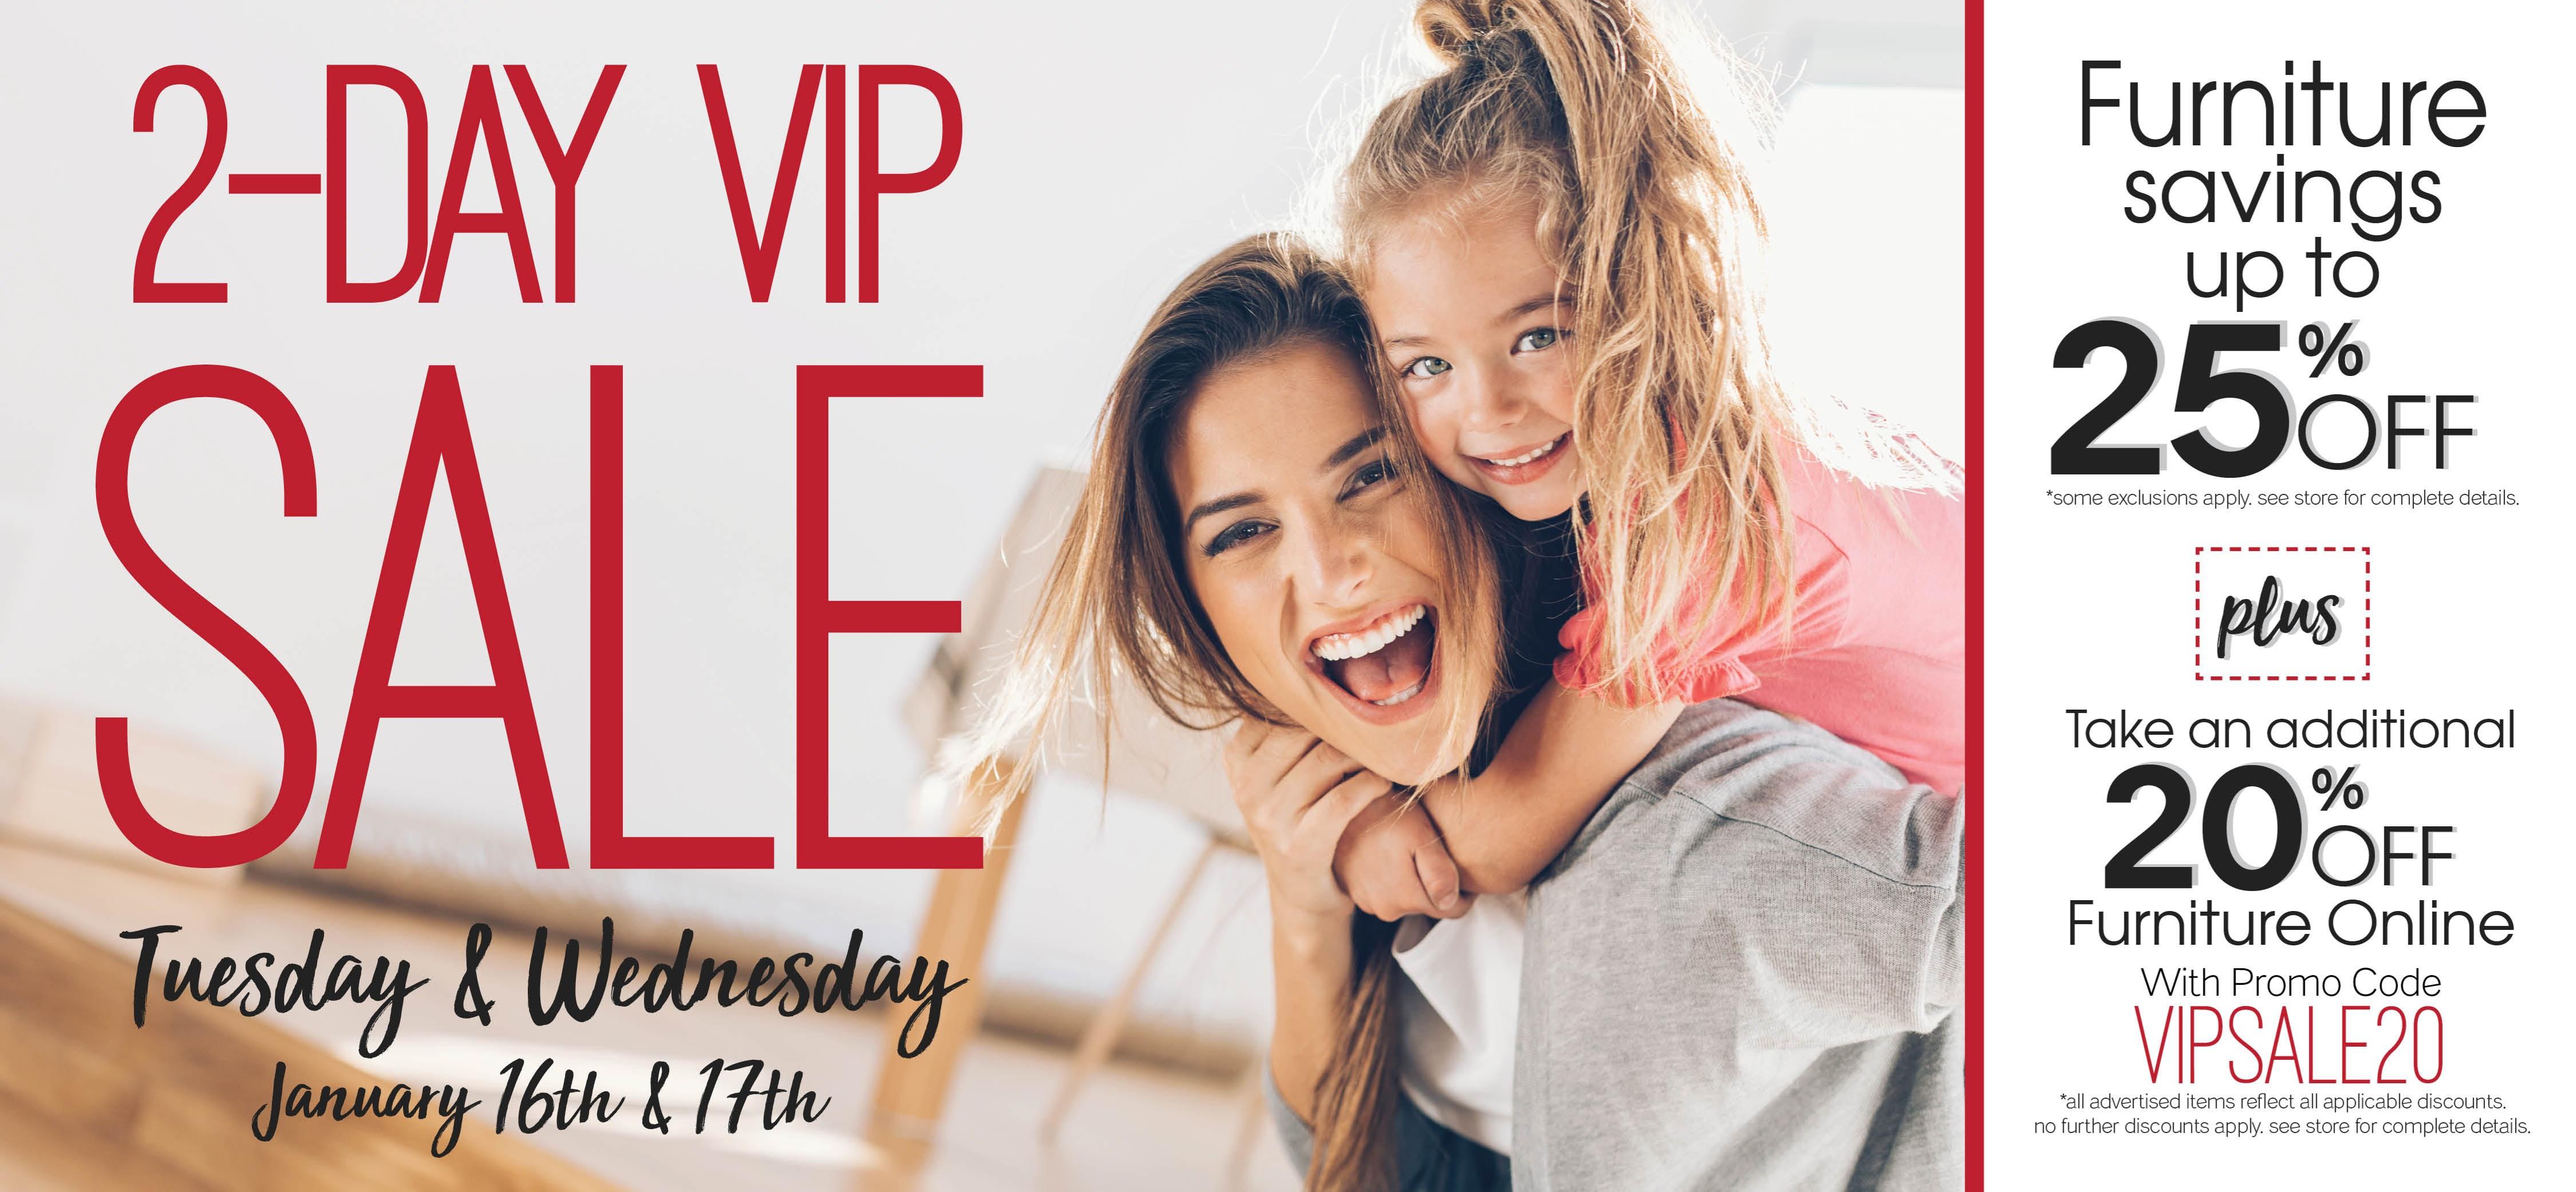 Furniture & ApplianceMart 2-Day VIP Sale